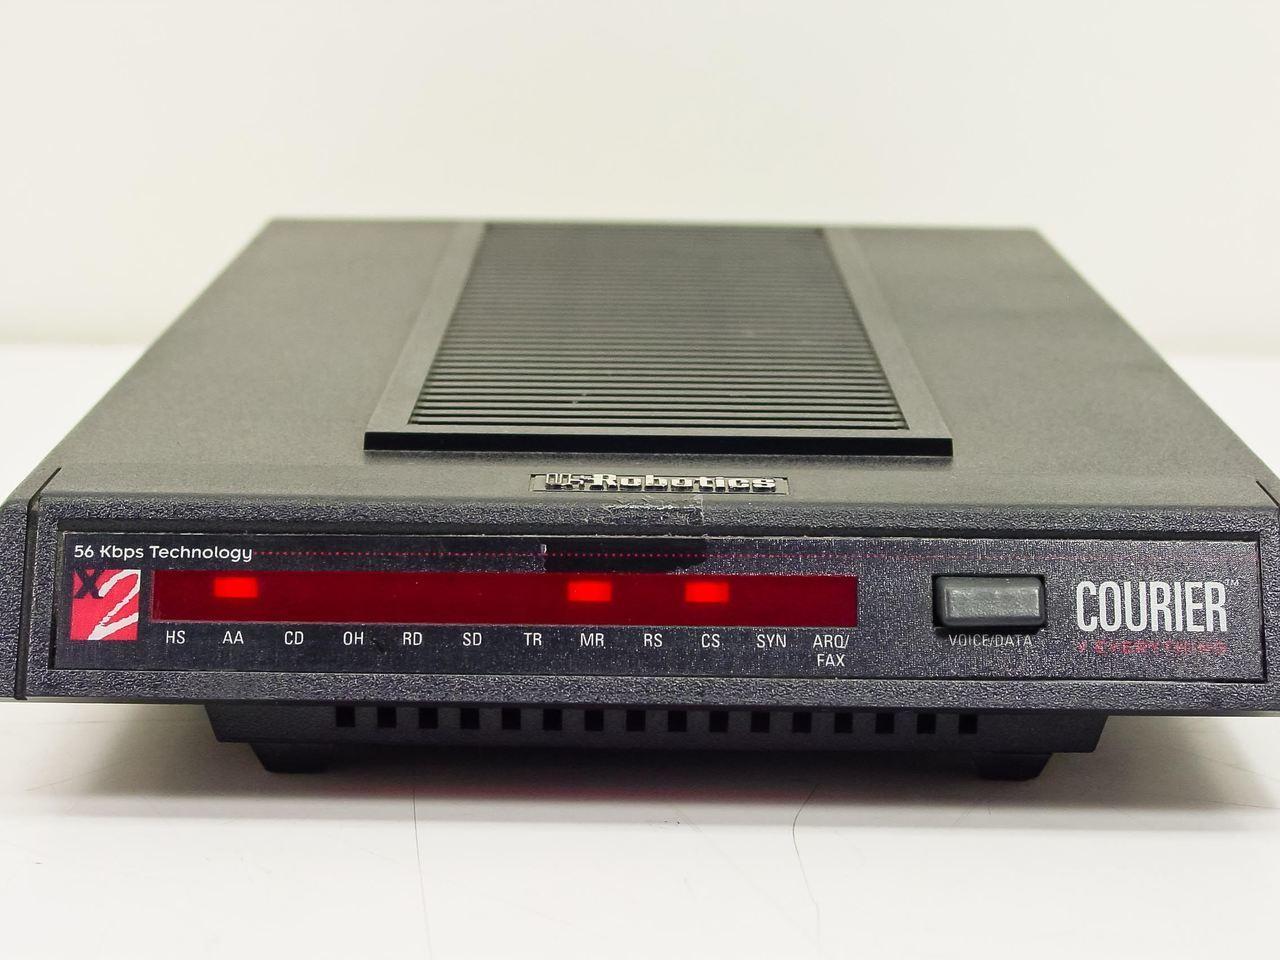 modem-dial-up-jpg.13352